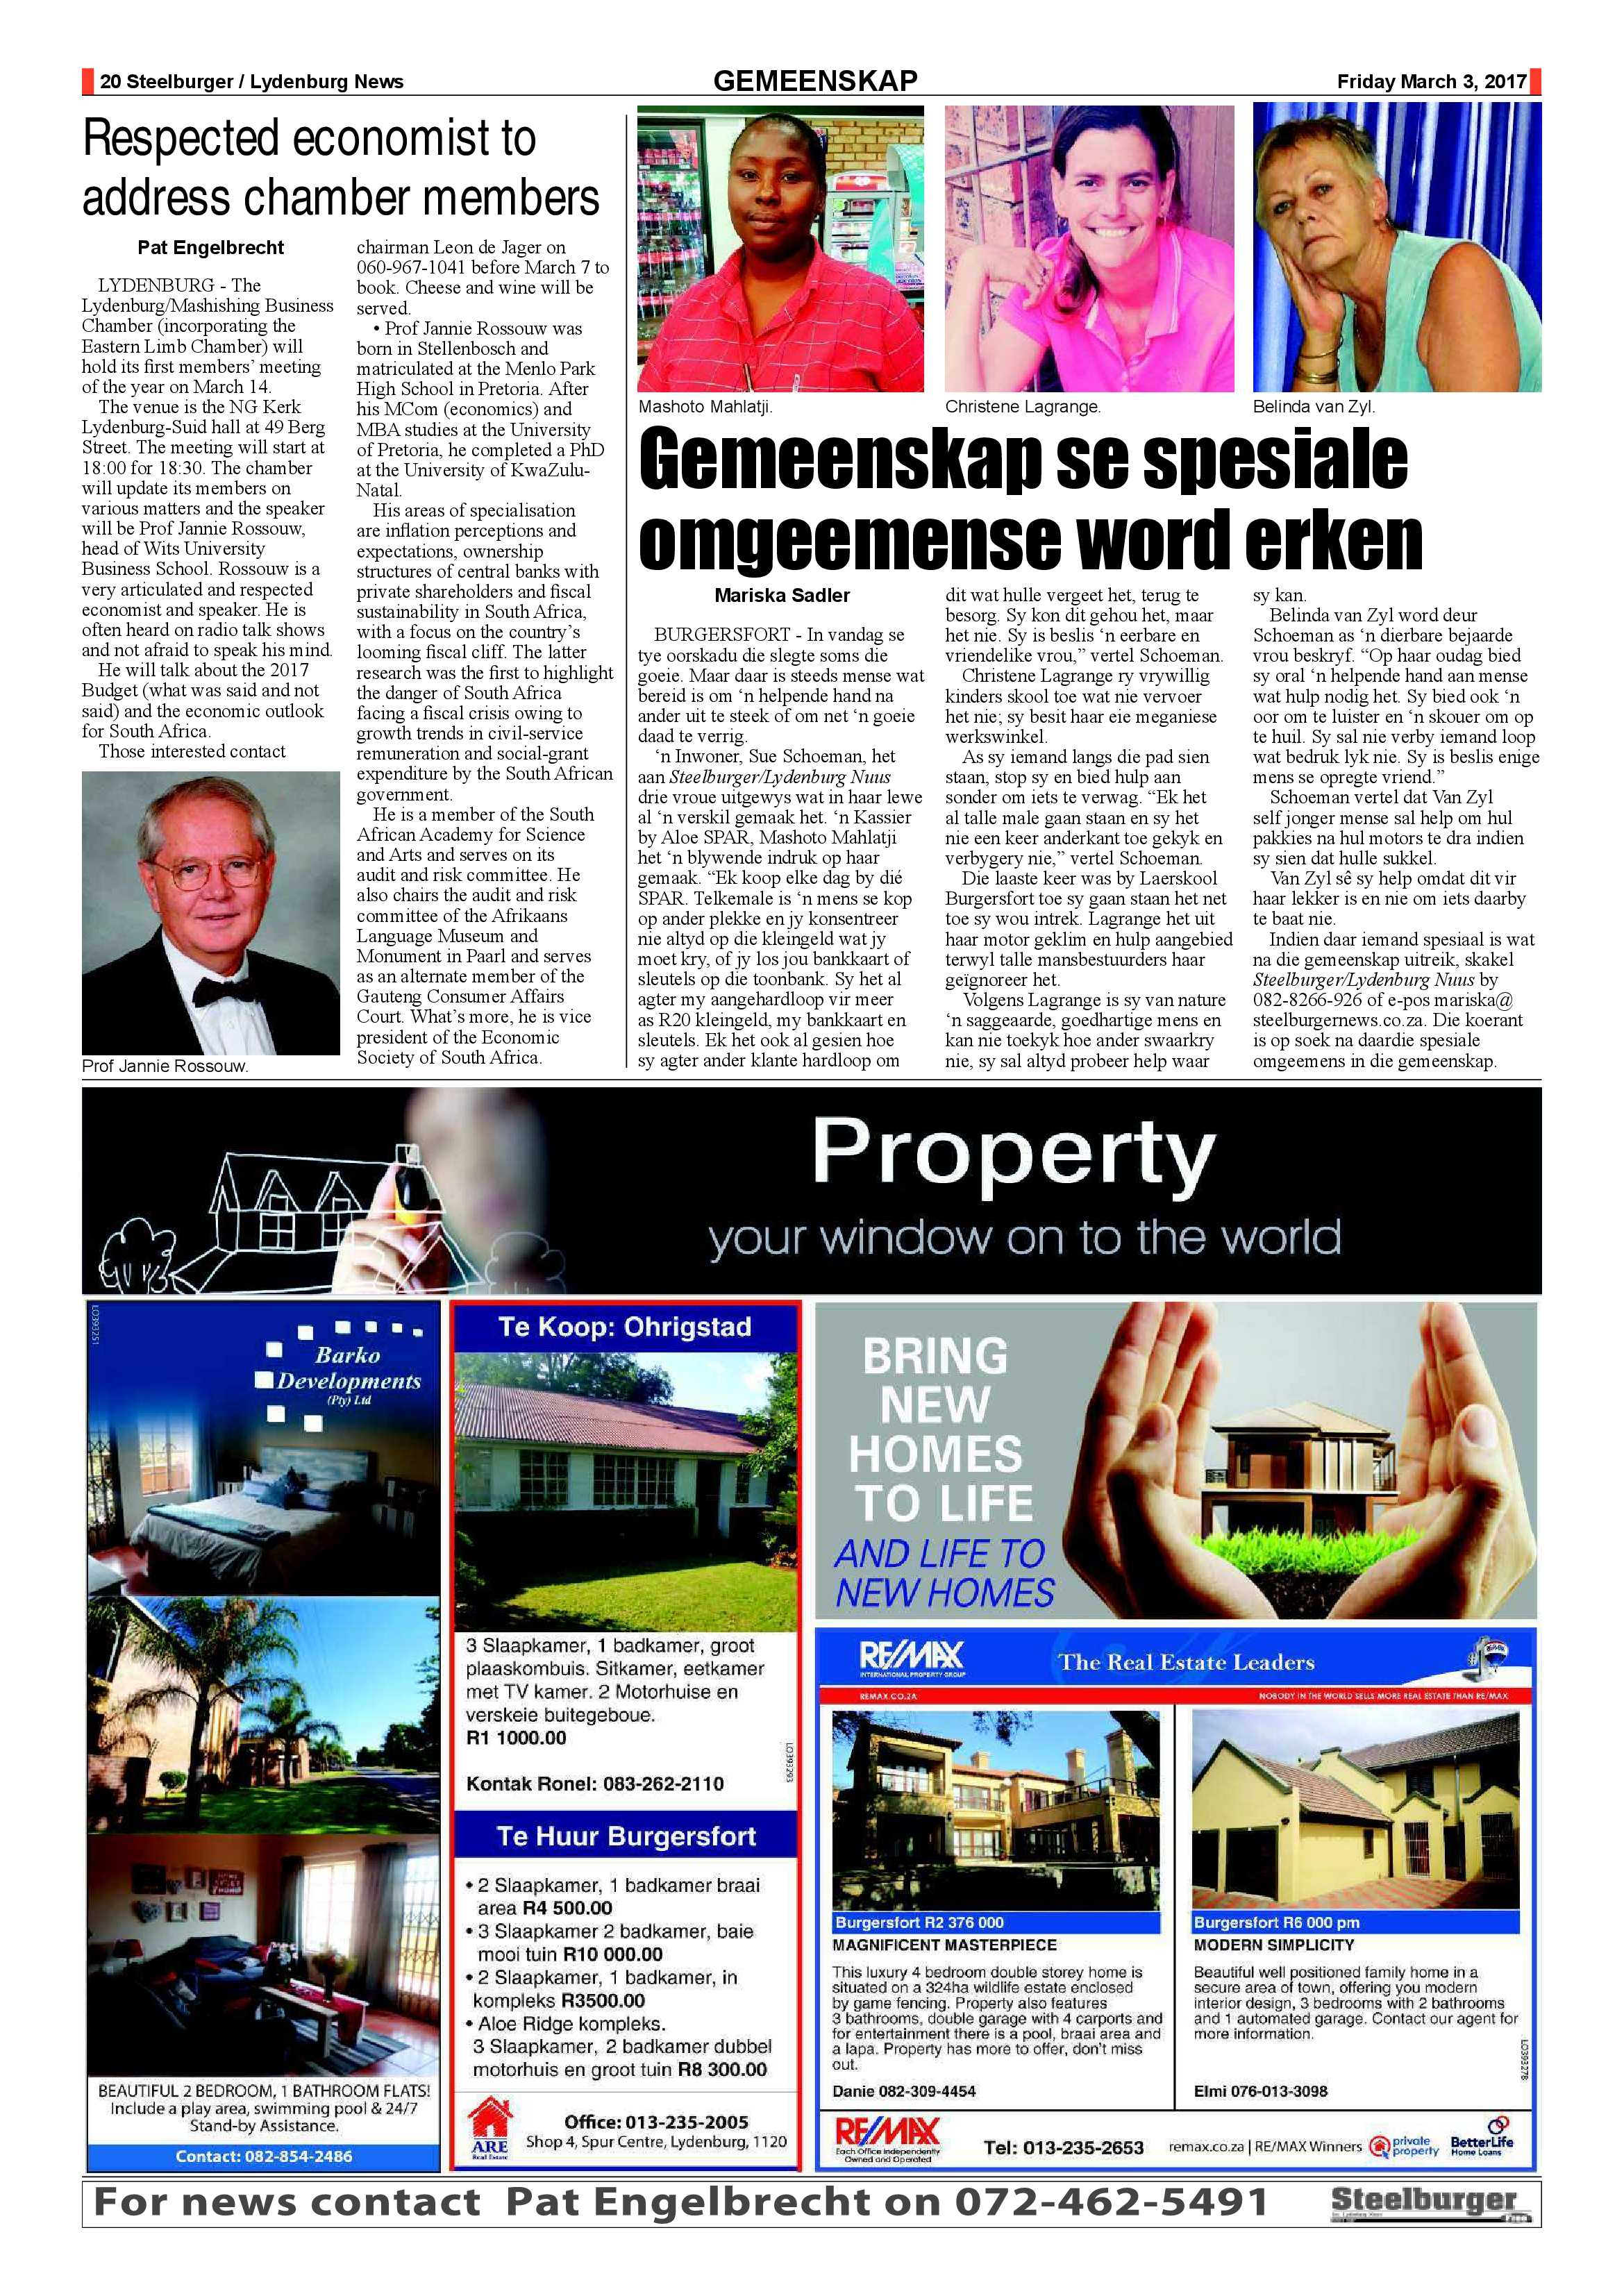 Steelburger News 3 March 2017 | Steelburger / Lydenburg News